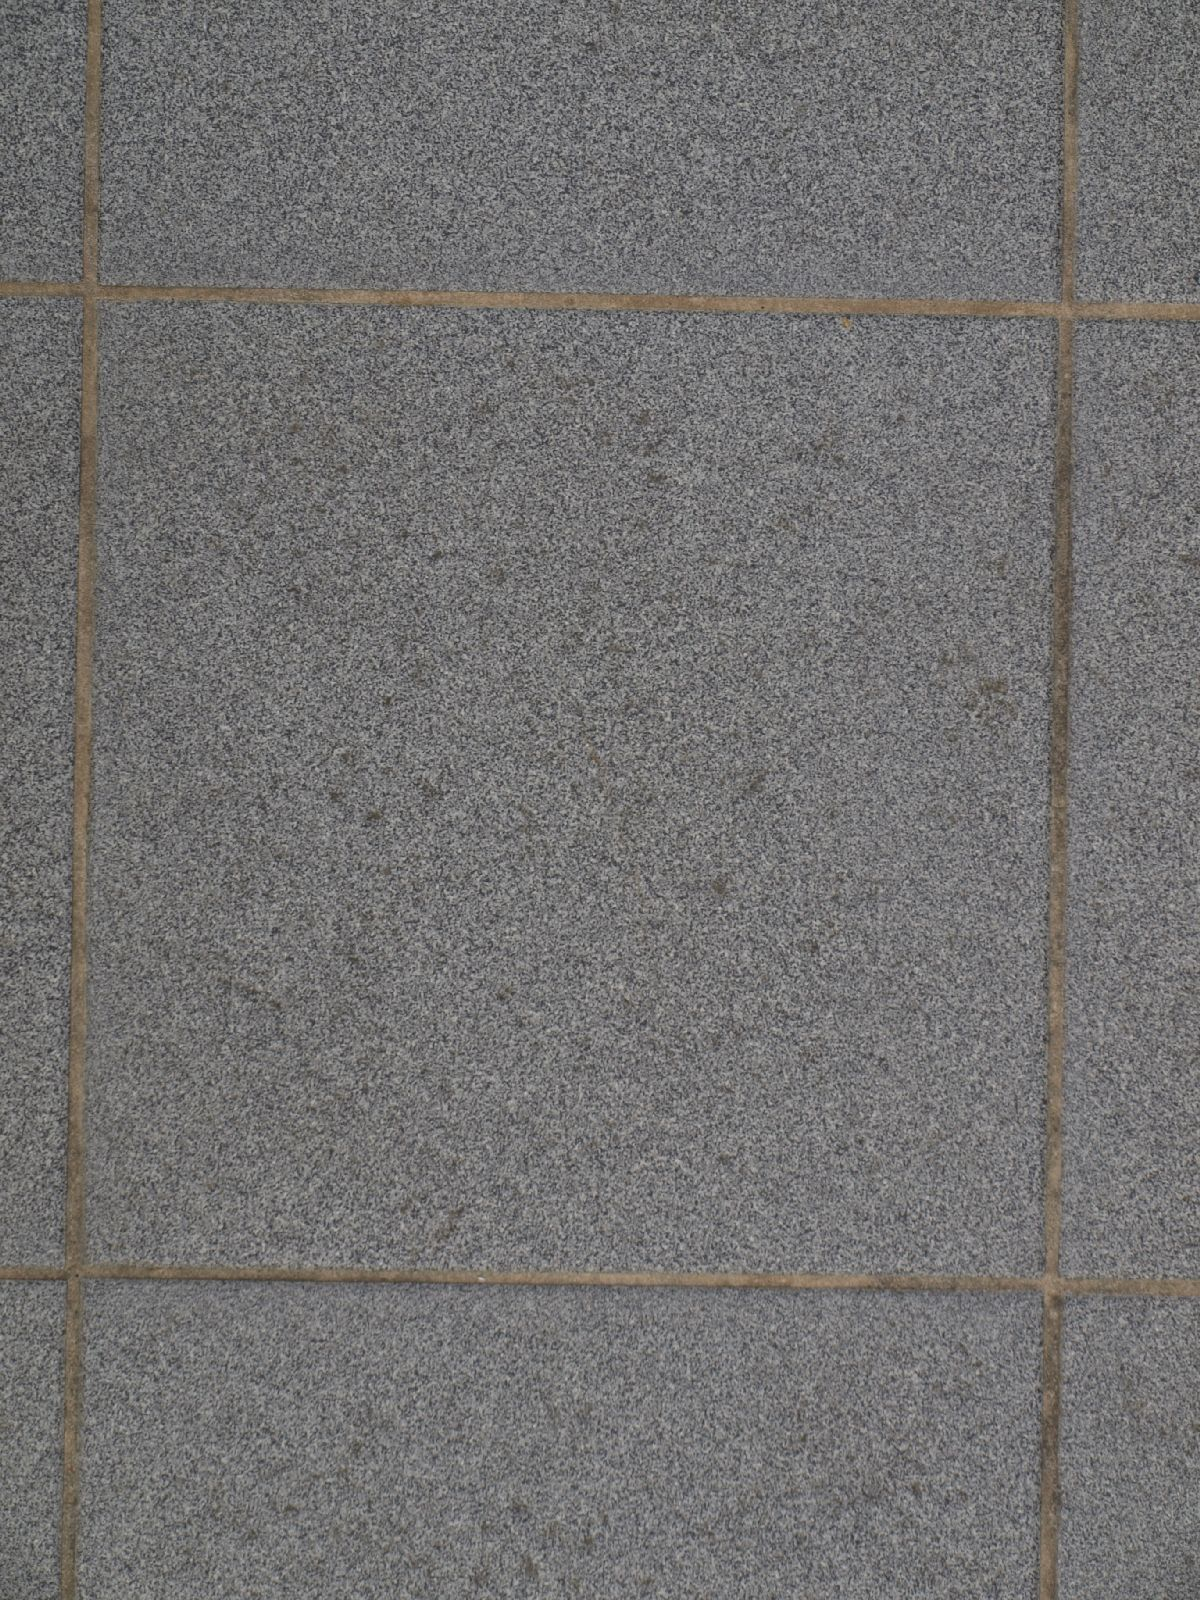 Ground-Urban_Texture_A_PA045709